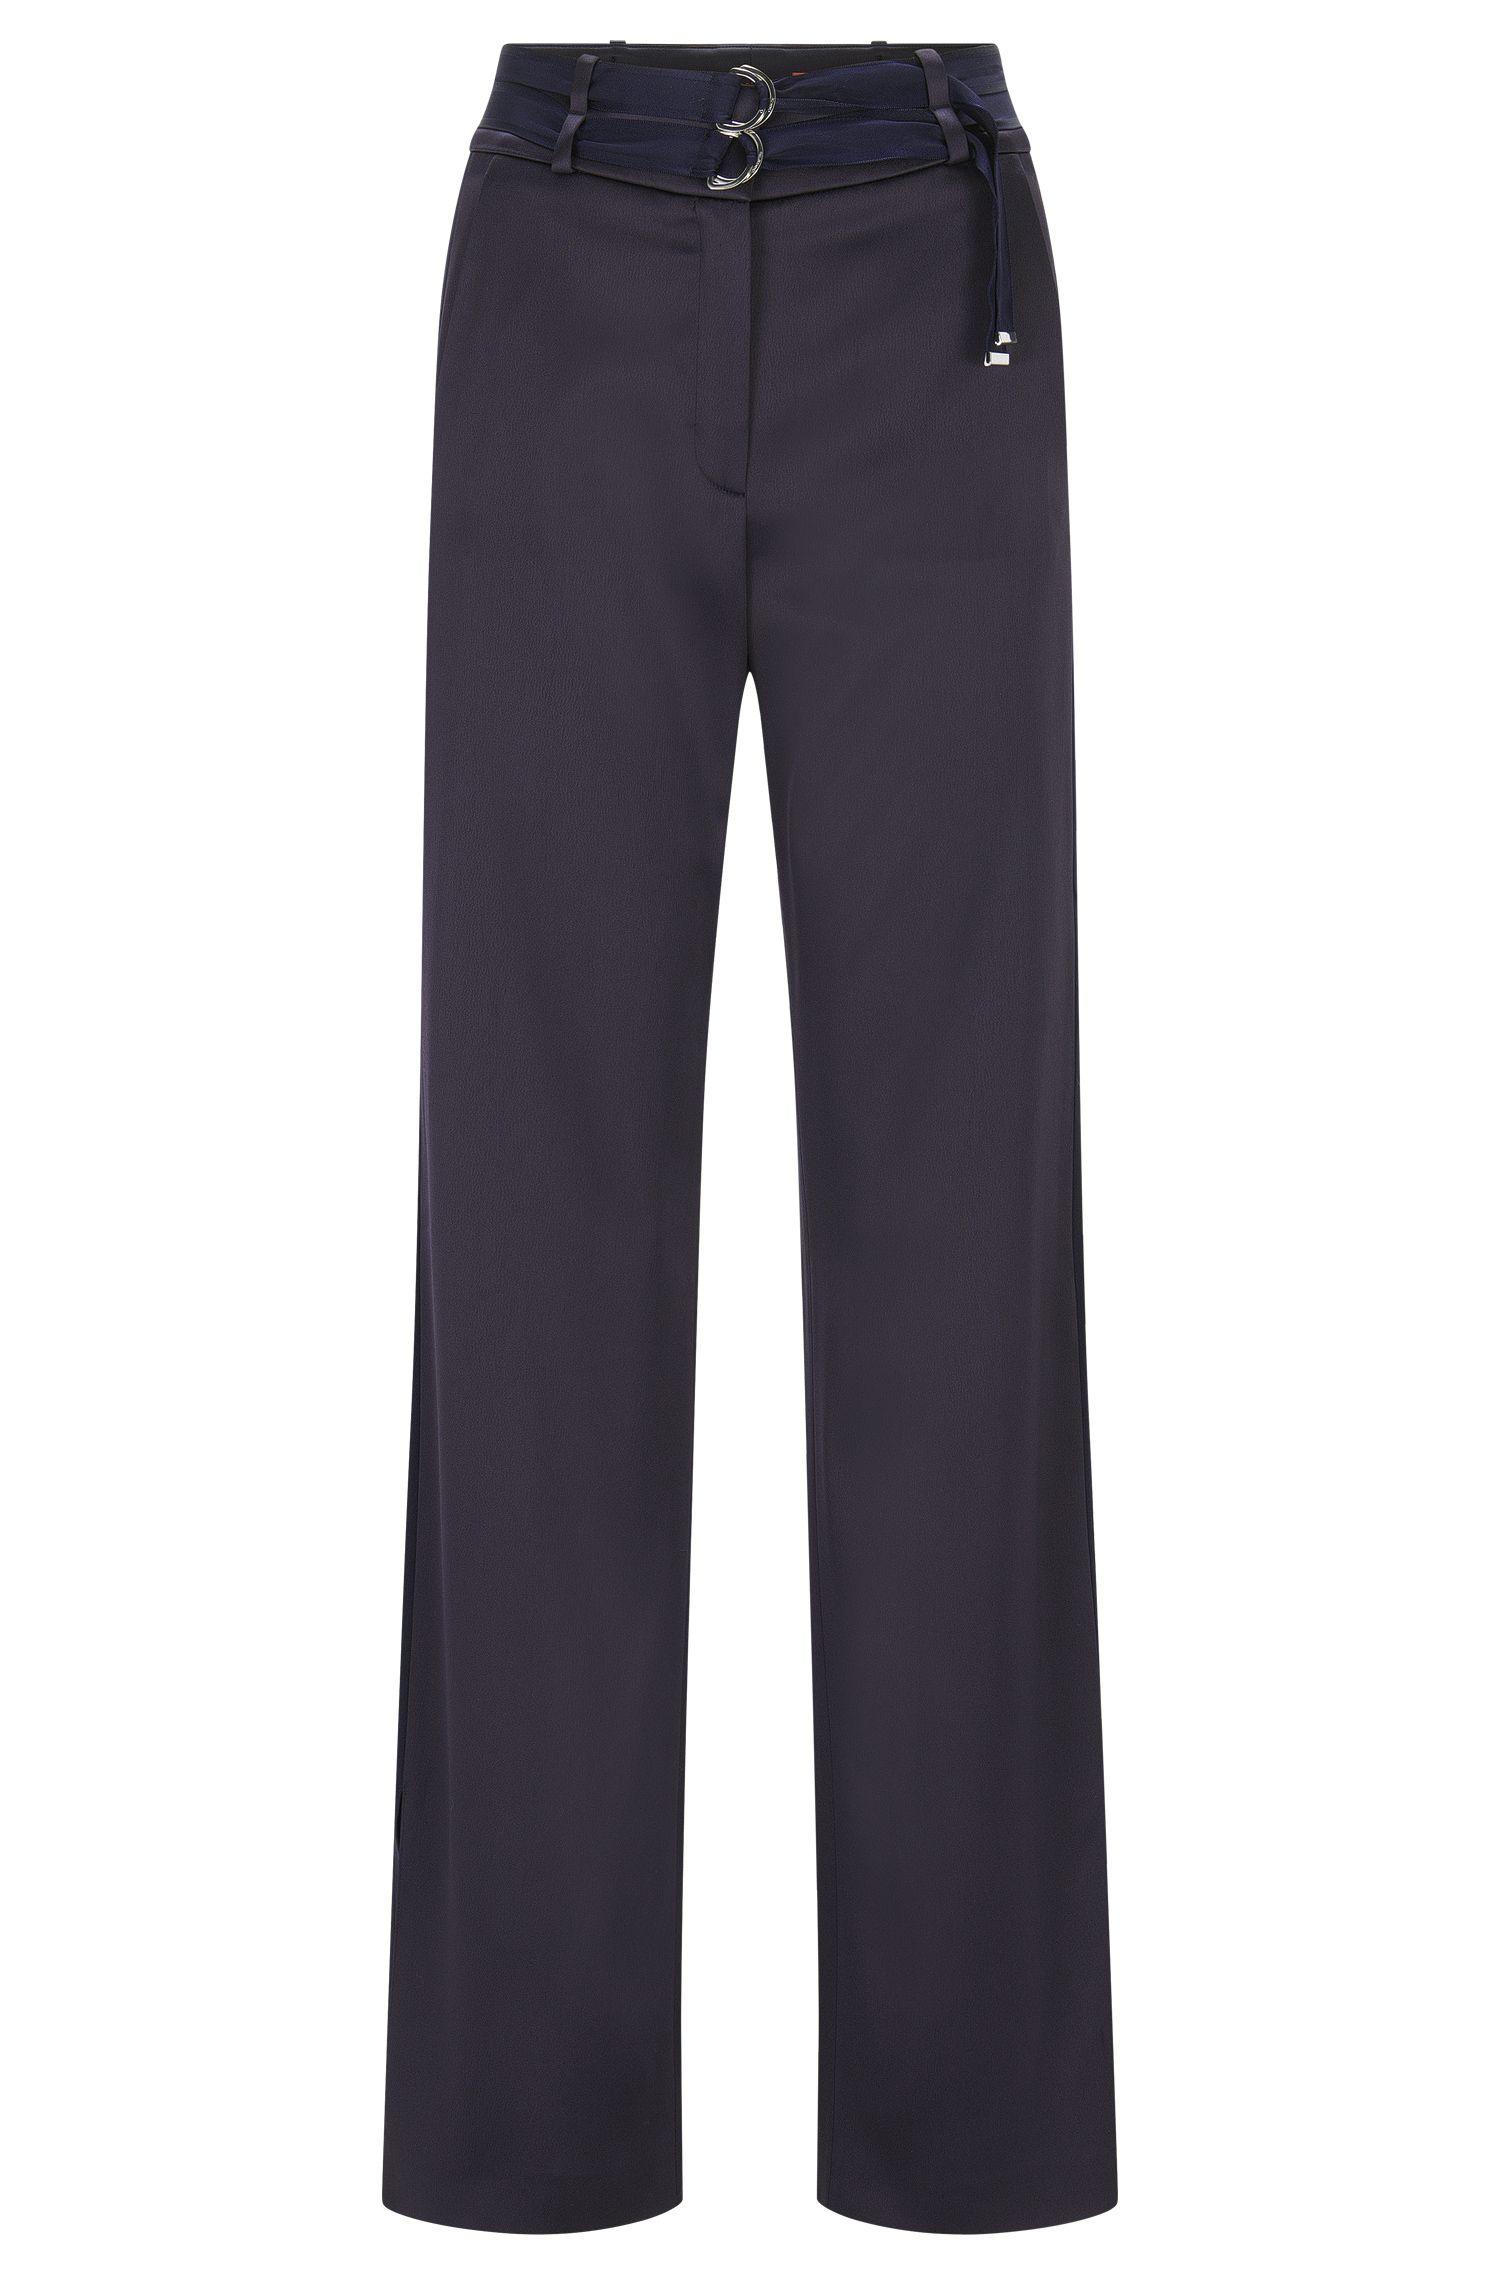 Pantaloni relaxed fit con cintura doppia